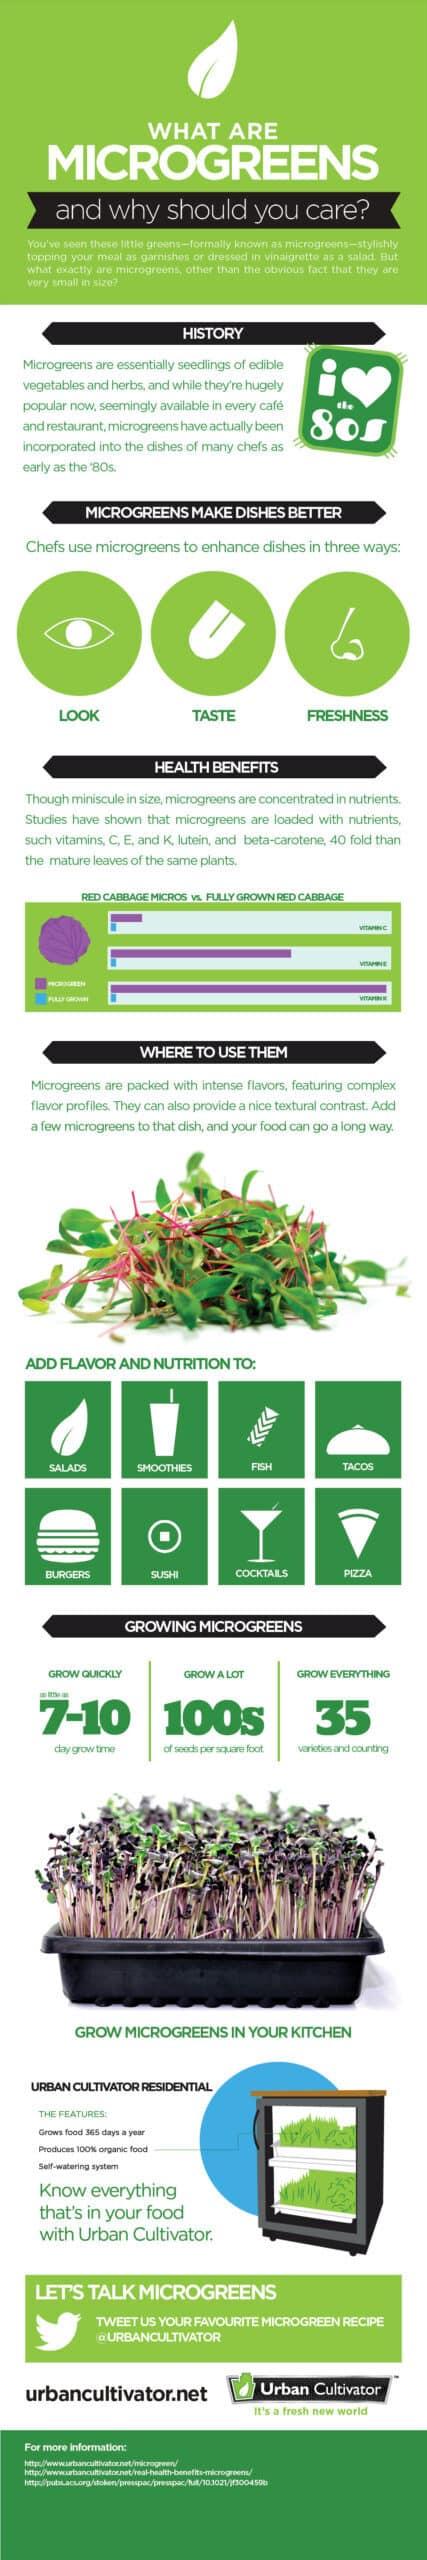 microgreens_infographic-8797948